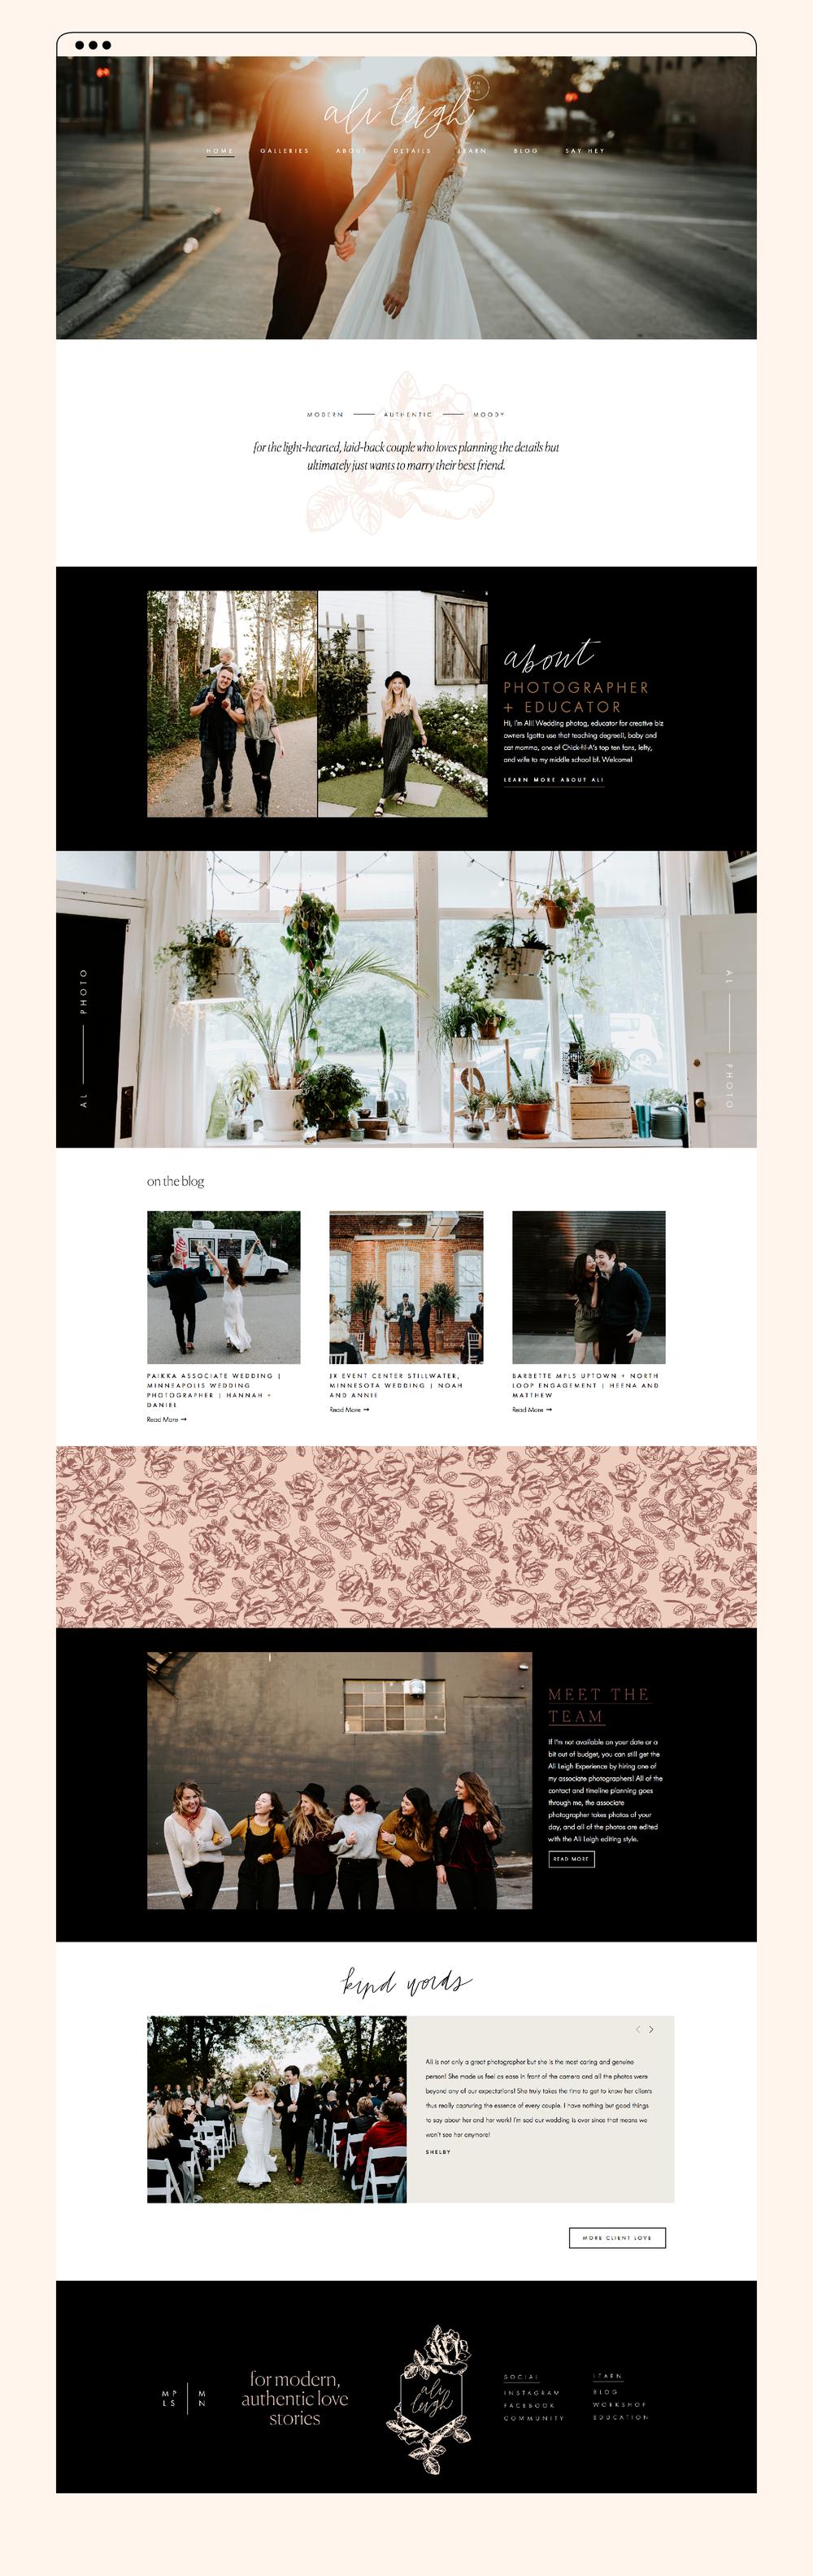 ali-leigh-photo-branding-logo-design-identity-handlettering-modern-circle-homepage-squarespace.png